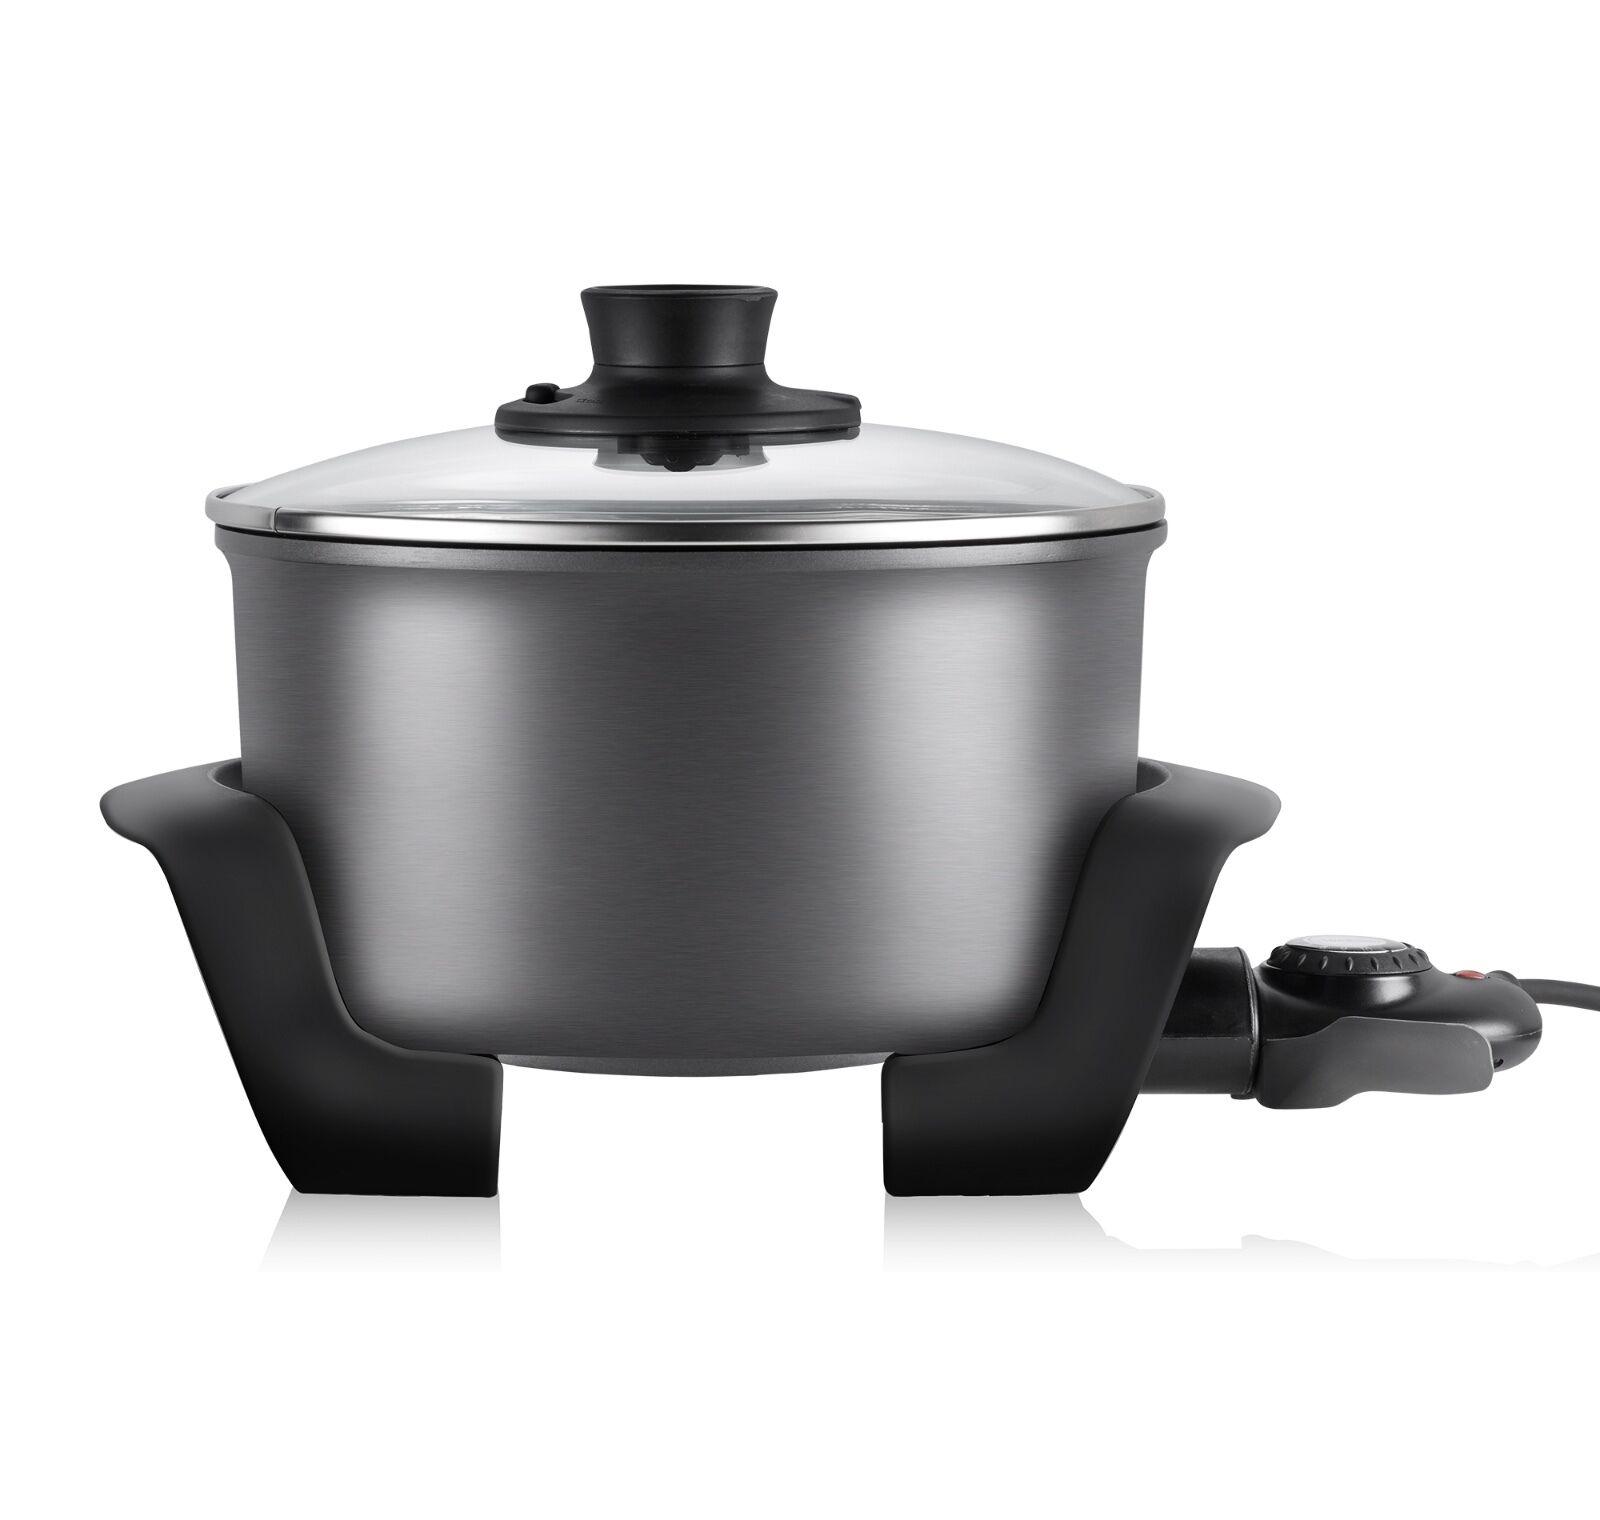 Sunbeam DF4500 MultiCooker Deep Fryer Boil, Roast, Casserole, Braise, Stir fry